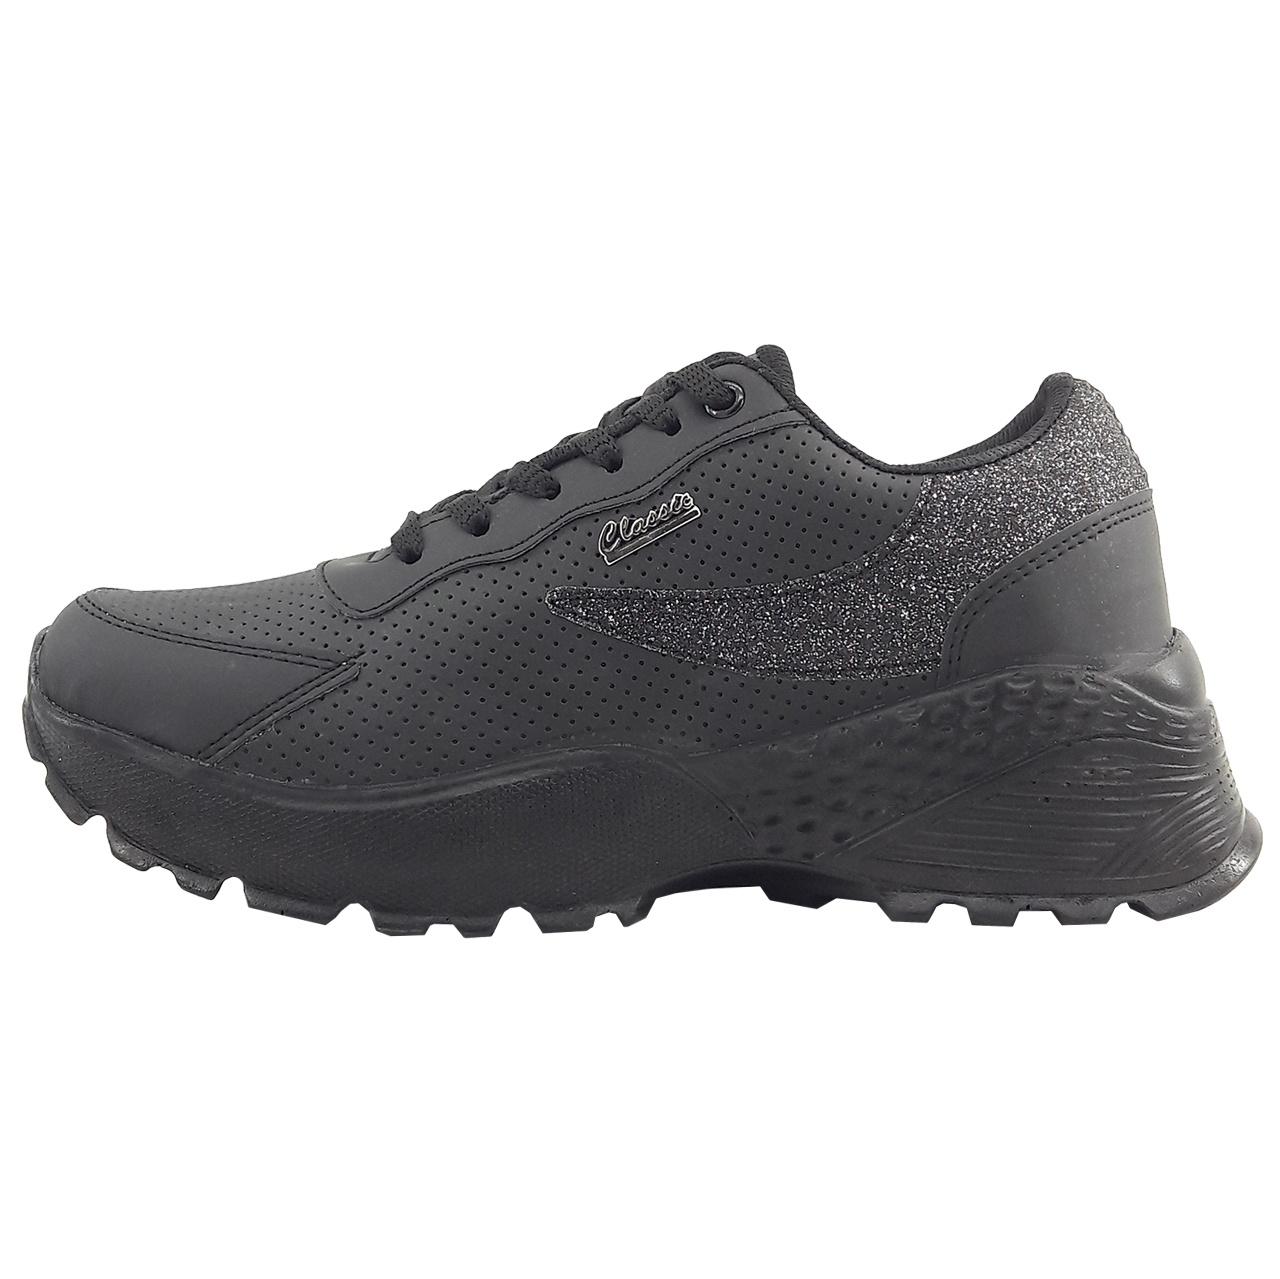 کفش راحتی زنانه مدل Gl.jh.bl-01